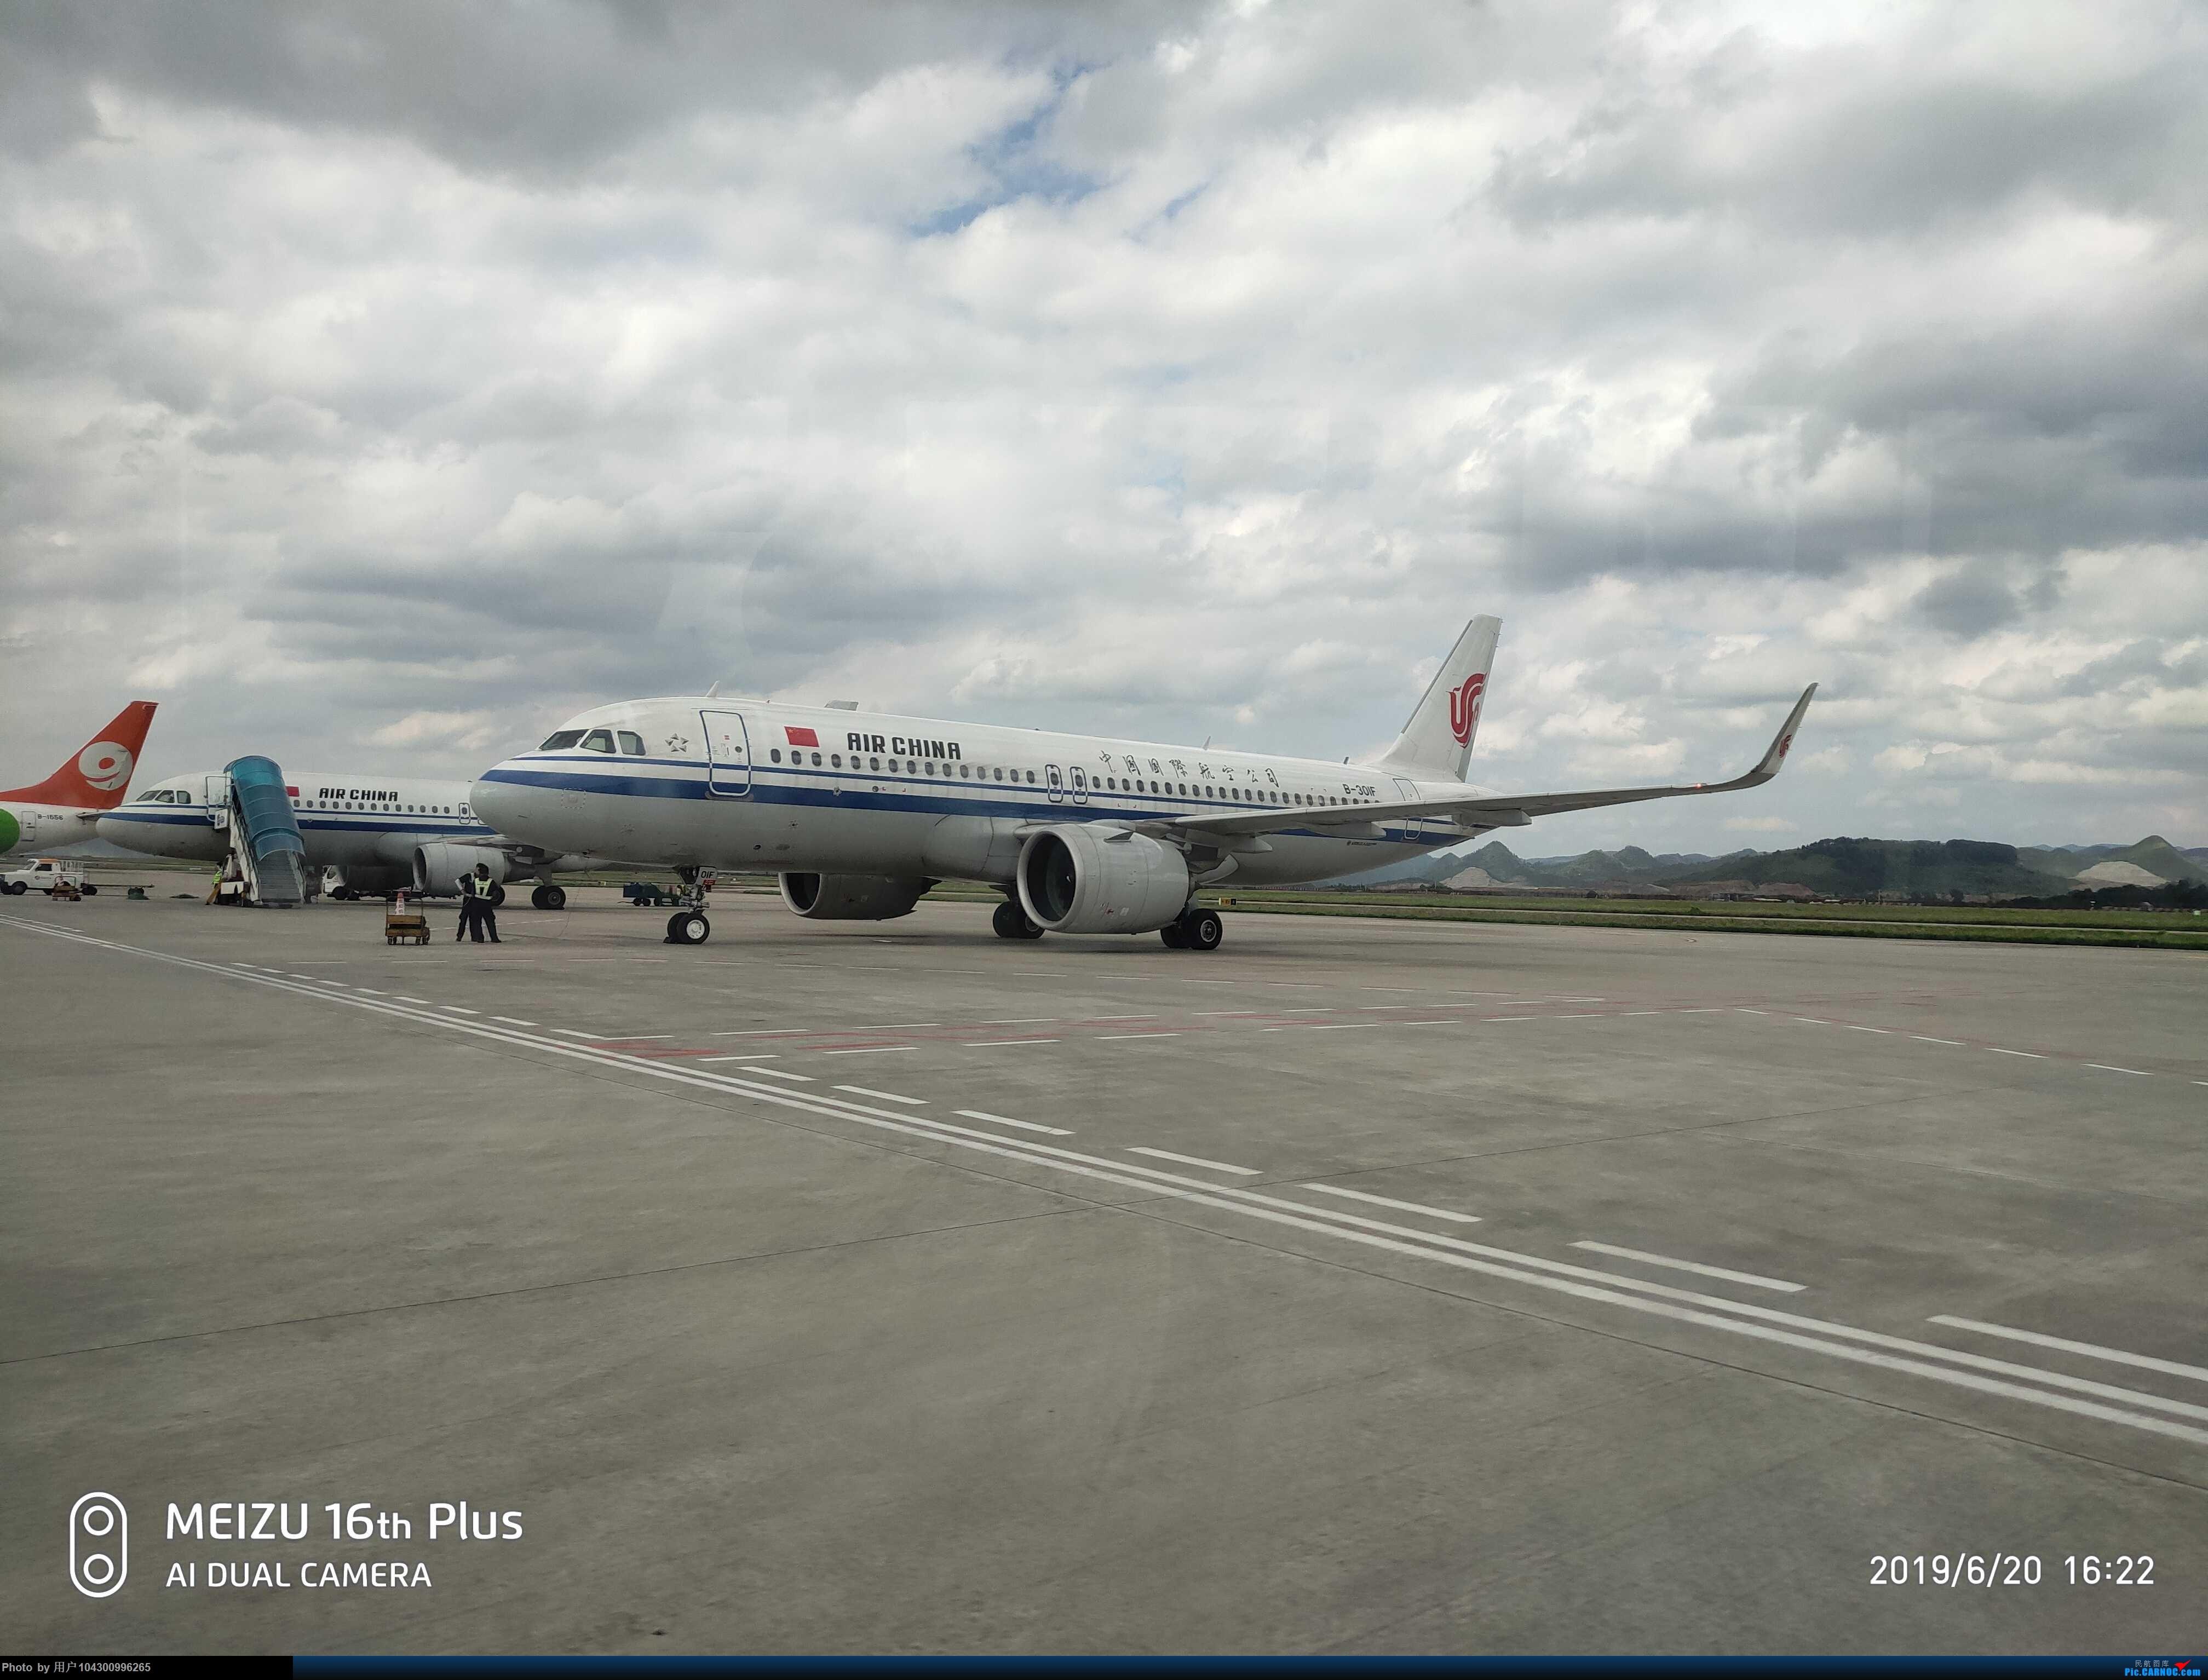 Re:[原创]DM哥飞行游记--贵阳往返荔波2日游 AIRBUS A320NEO B-301F 中国贵阳龙洞堡国际机场